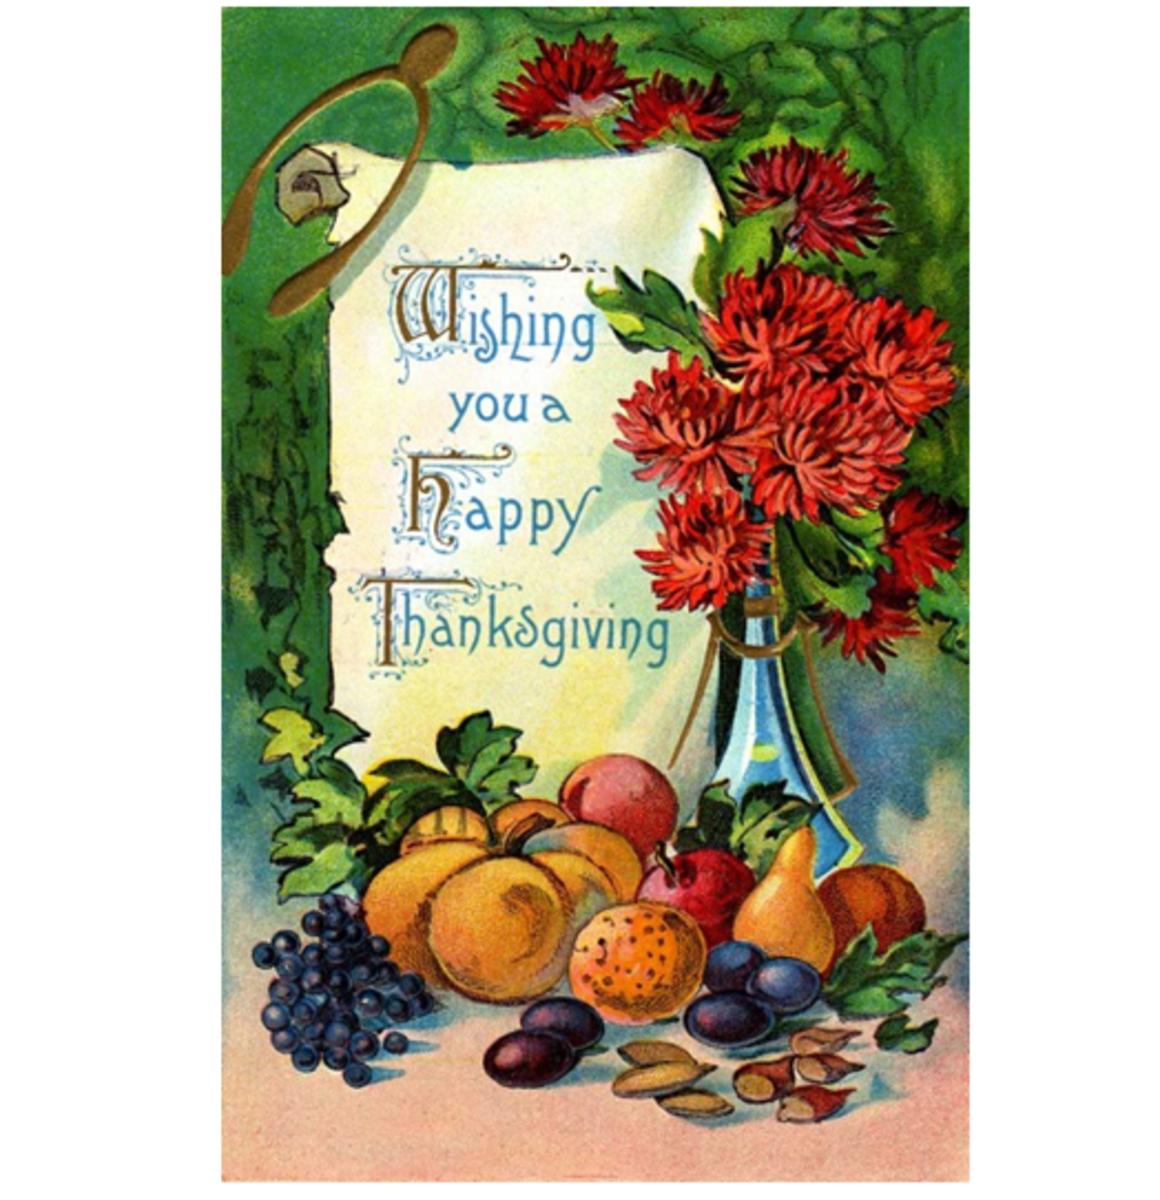 Happy Thanksgiving Wish with Turkey Wishbone